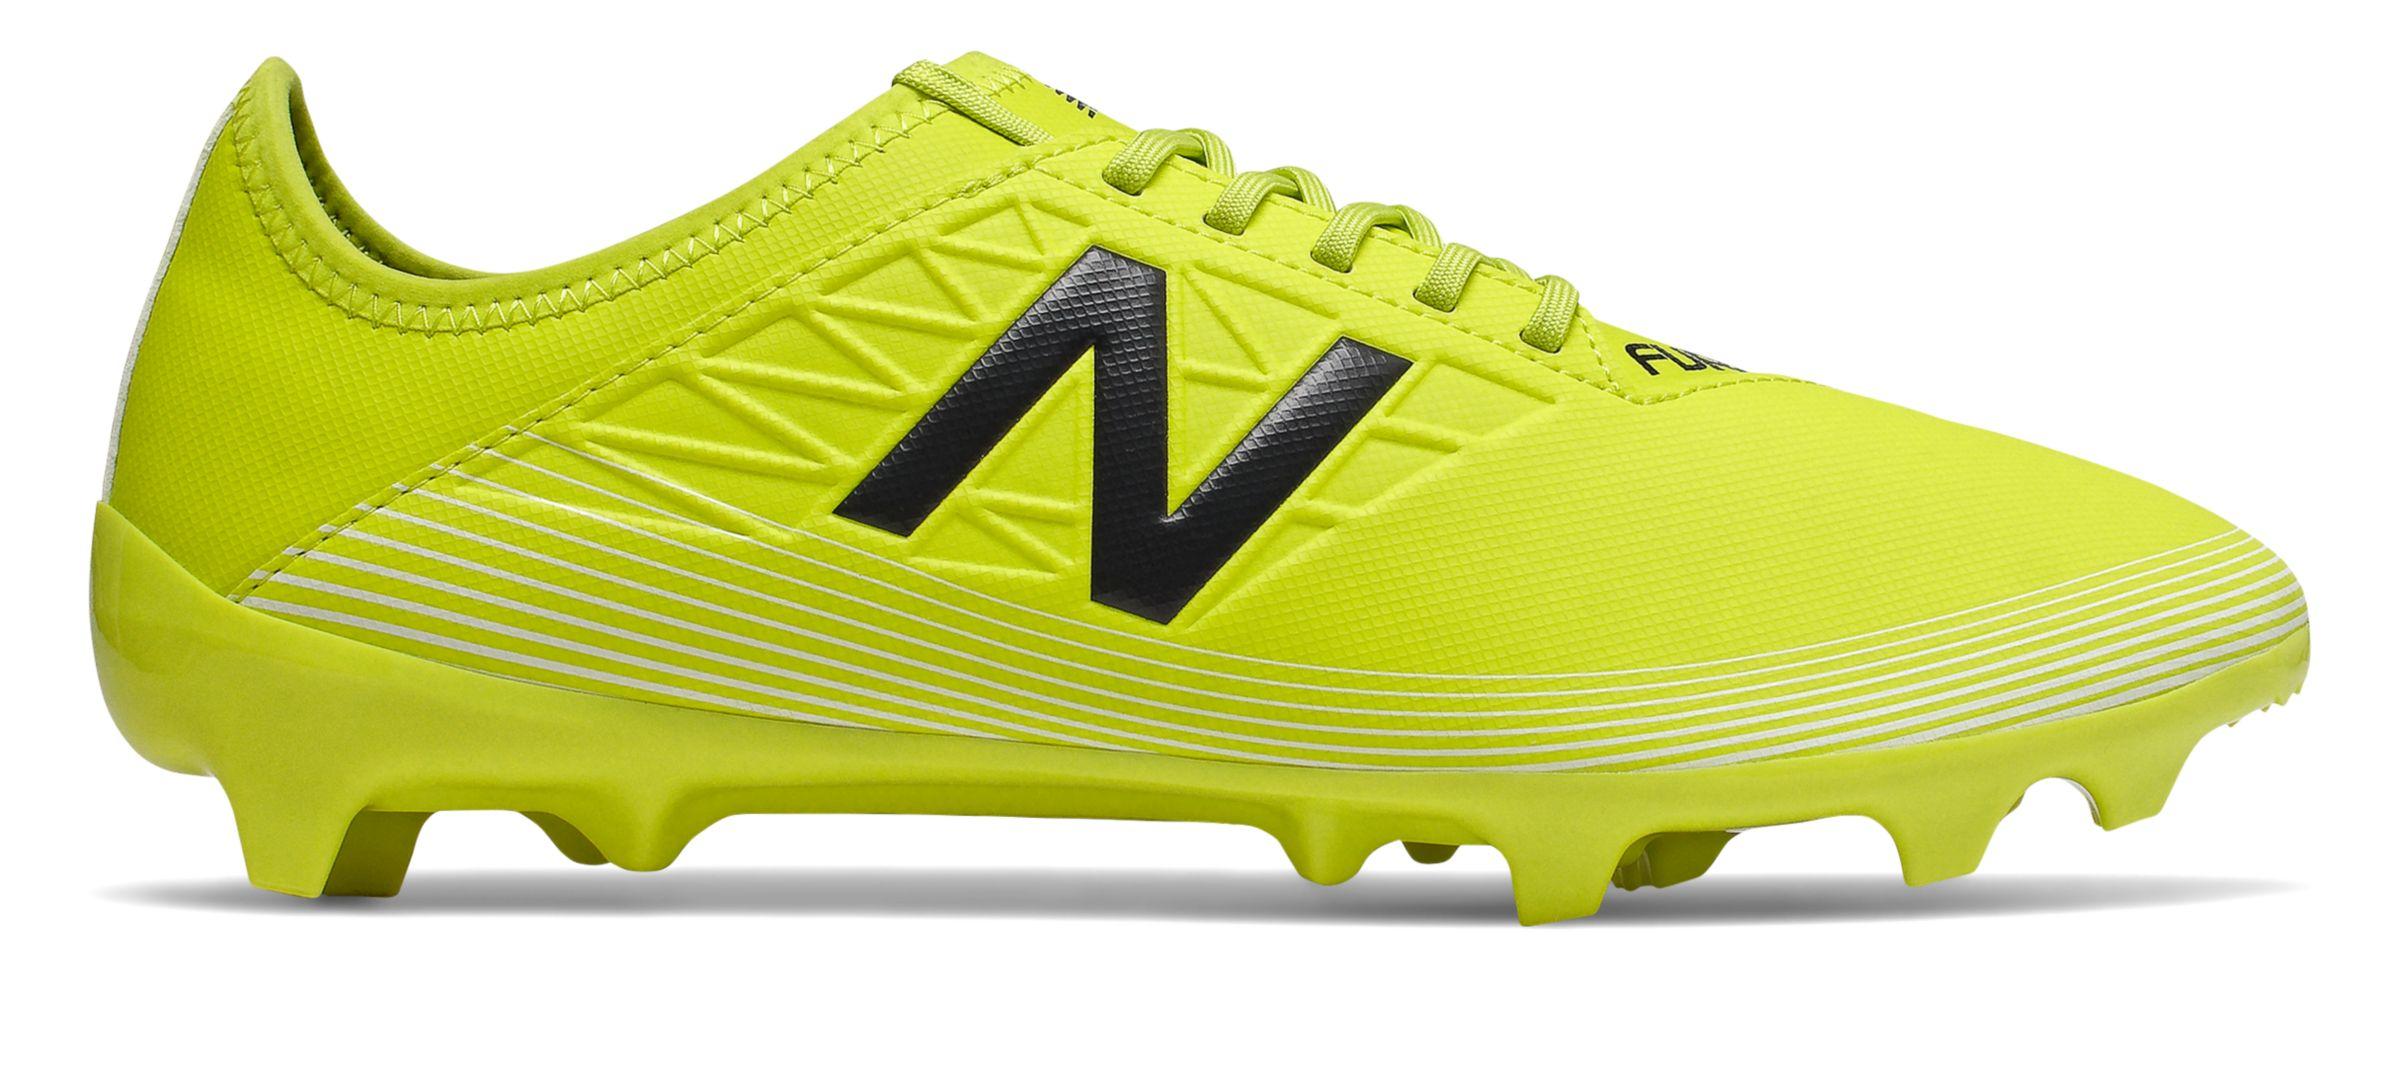 New Balance Men's Furon v5 Dispatch FG Soccer Cleat Shoes Ye